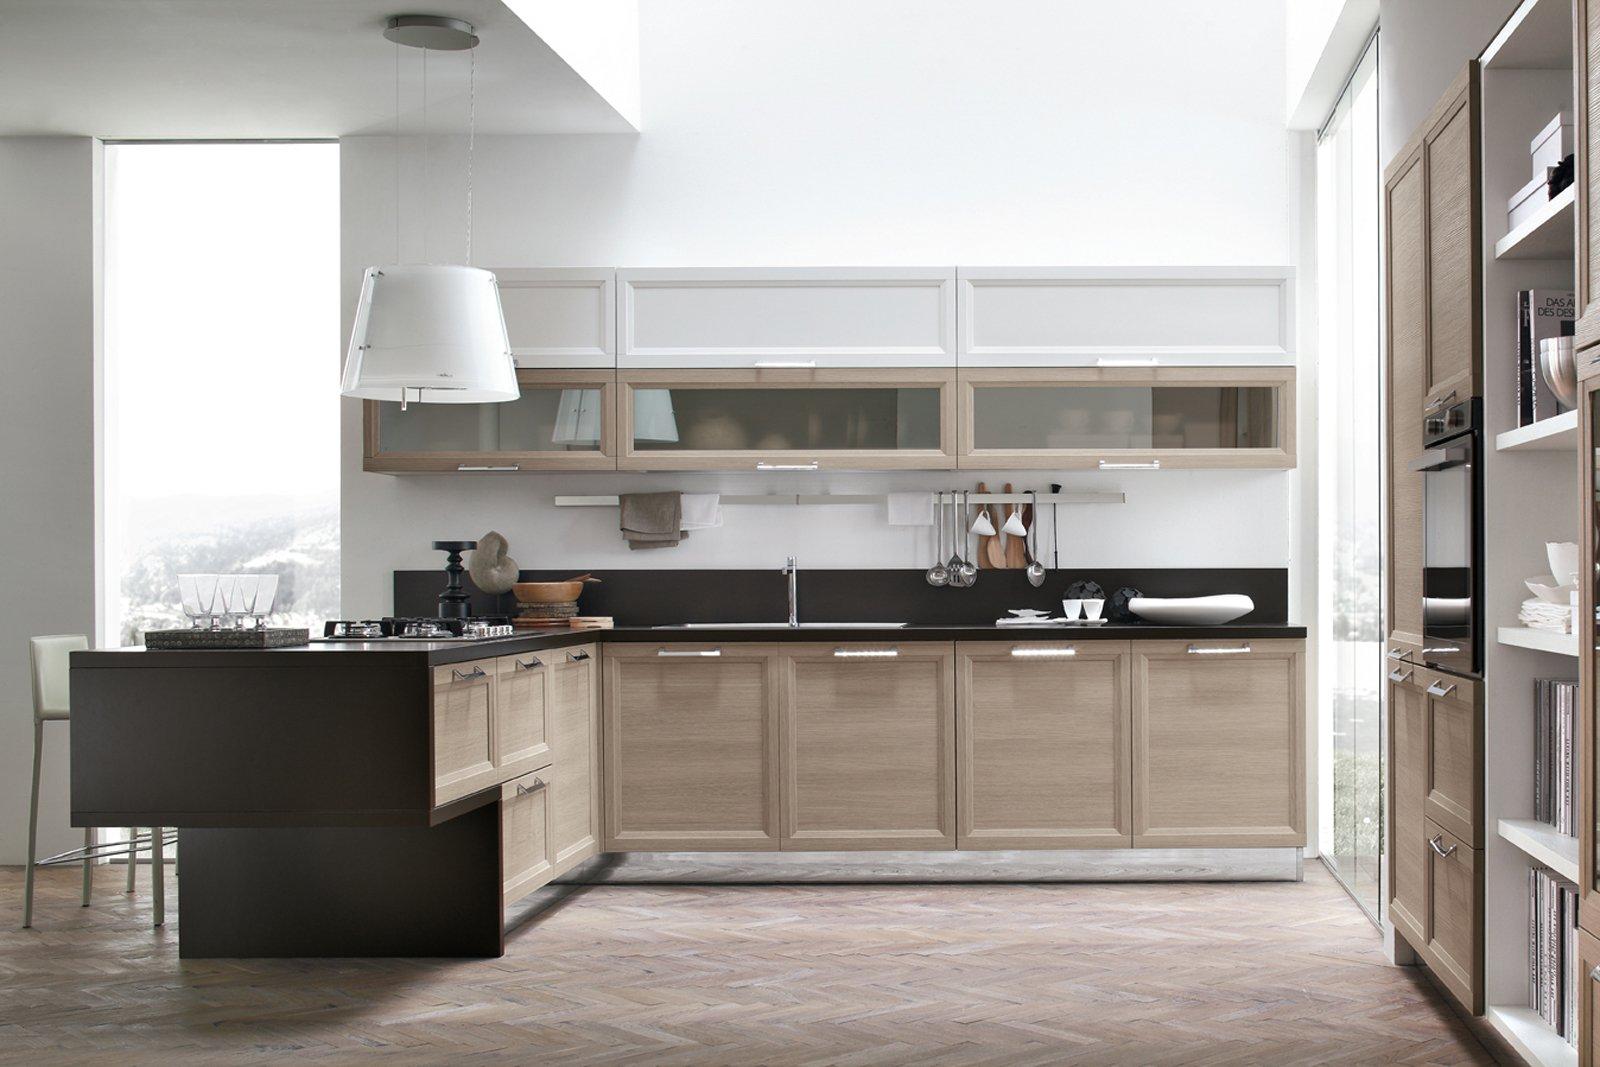 Cucina a penisola idee di design per la casa for Idee di design per la casa sul lungomare